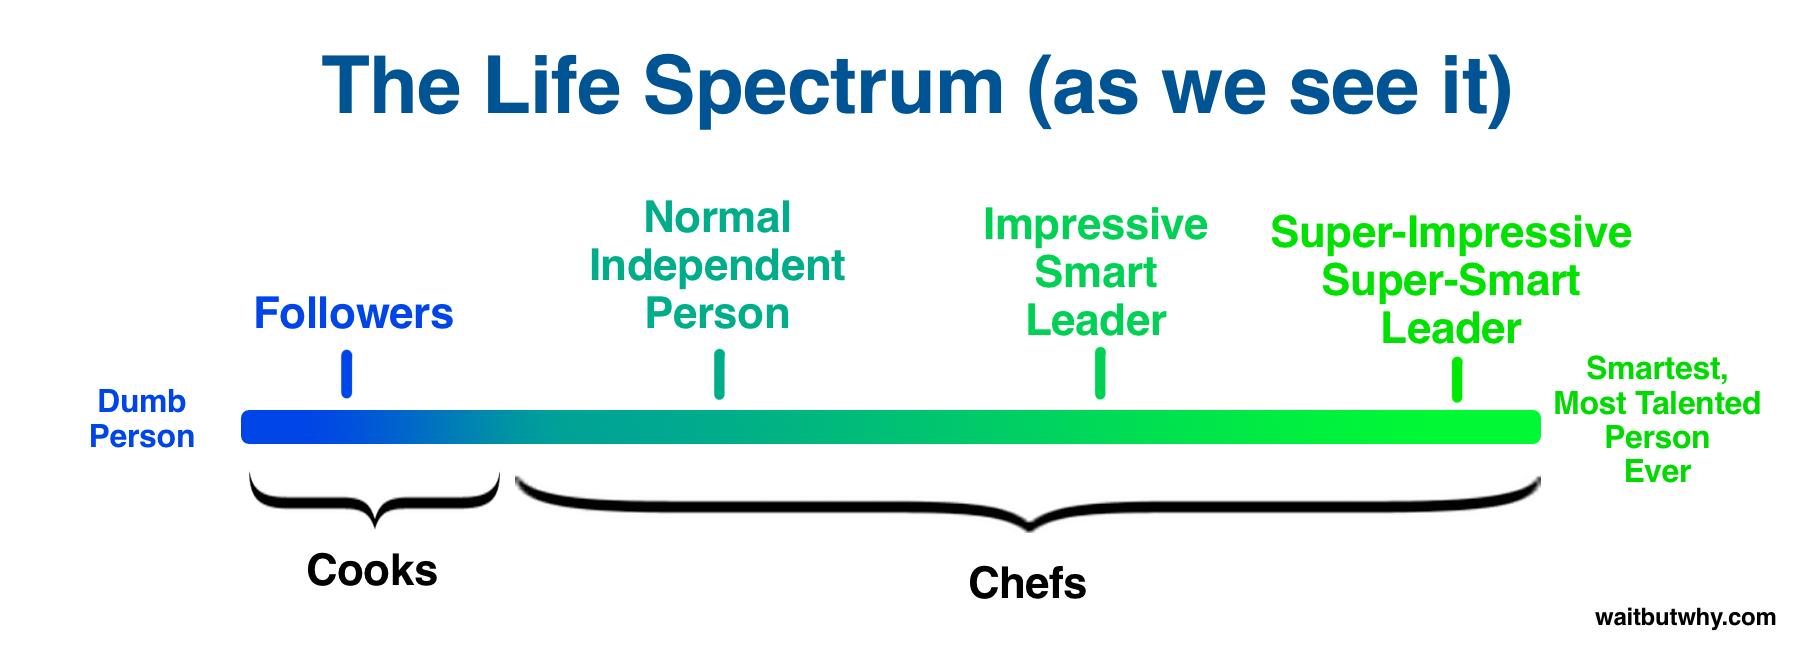 Chef-Cook Life Spectrum Skewed